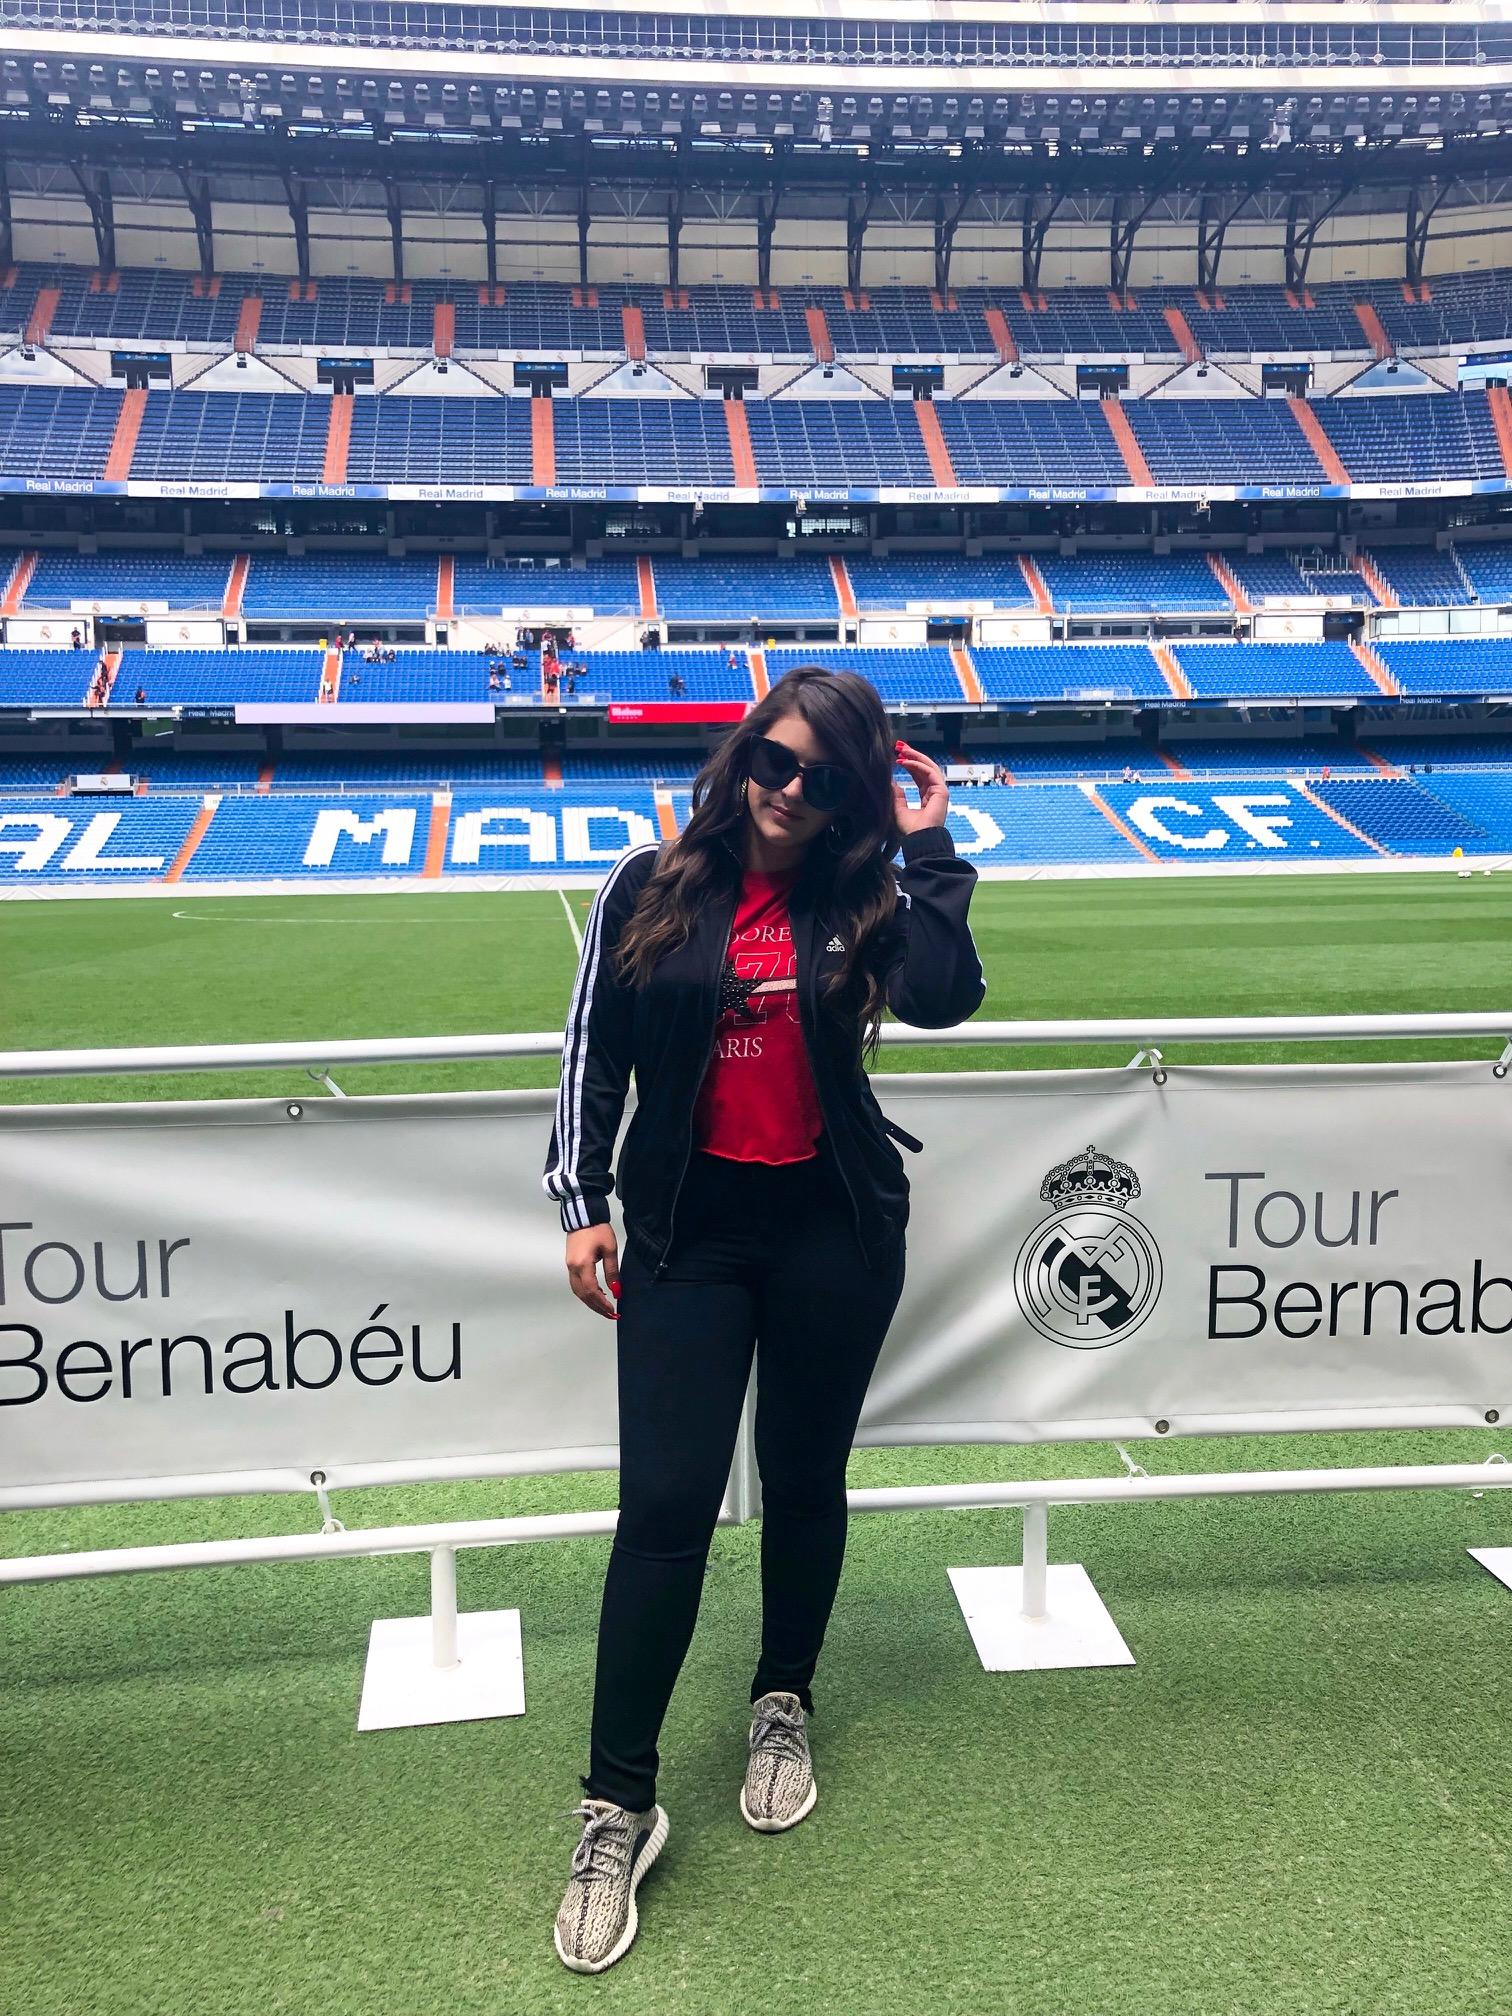 Santiago Bernabeu Stadium - Madrid Spain - Real Madrid - Beyond Casual B